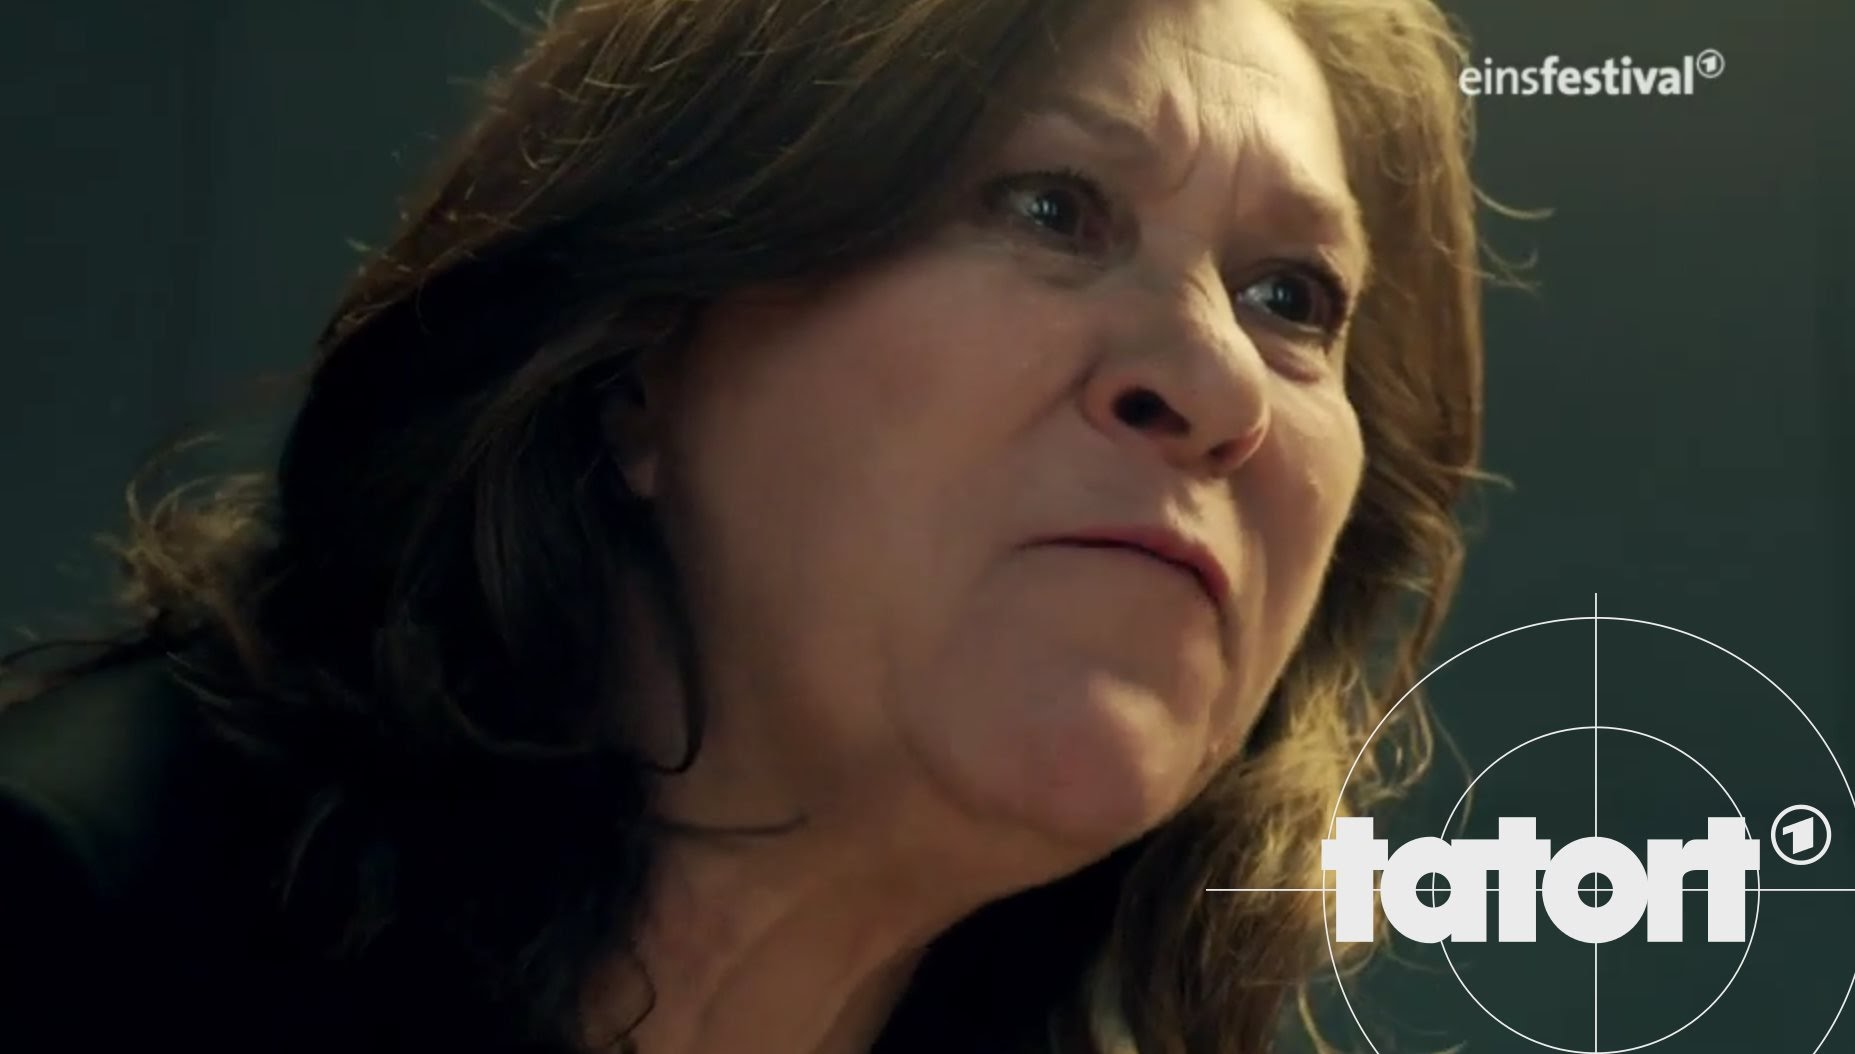 Tatort Rebecca (Sonntag 10.1.2016) - Trailer